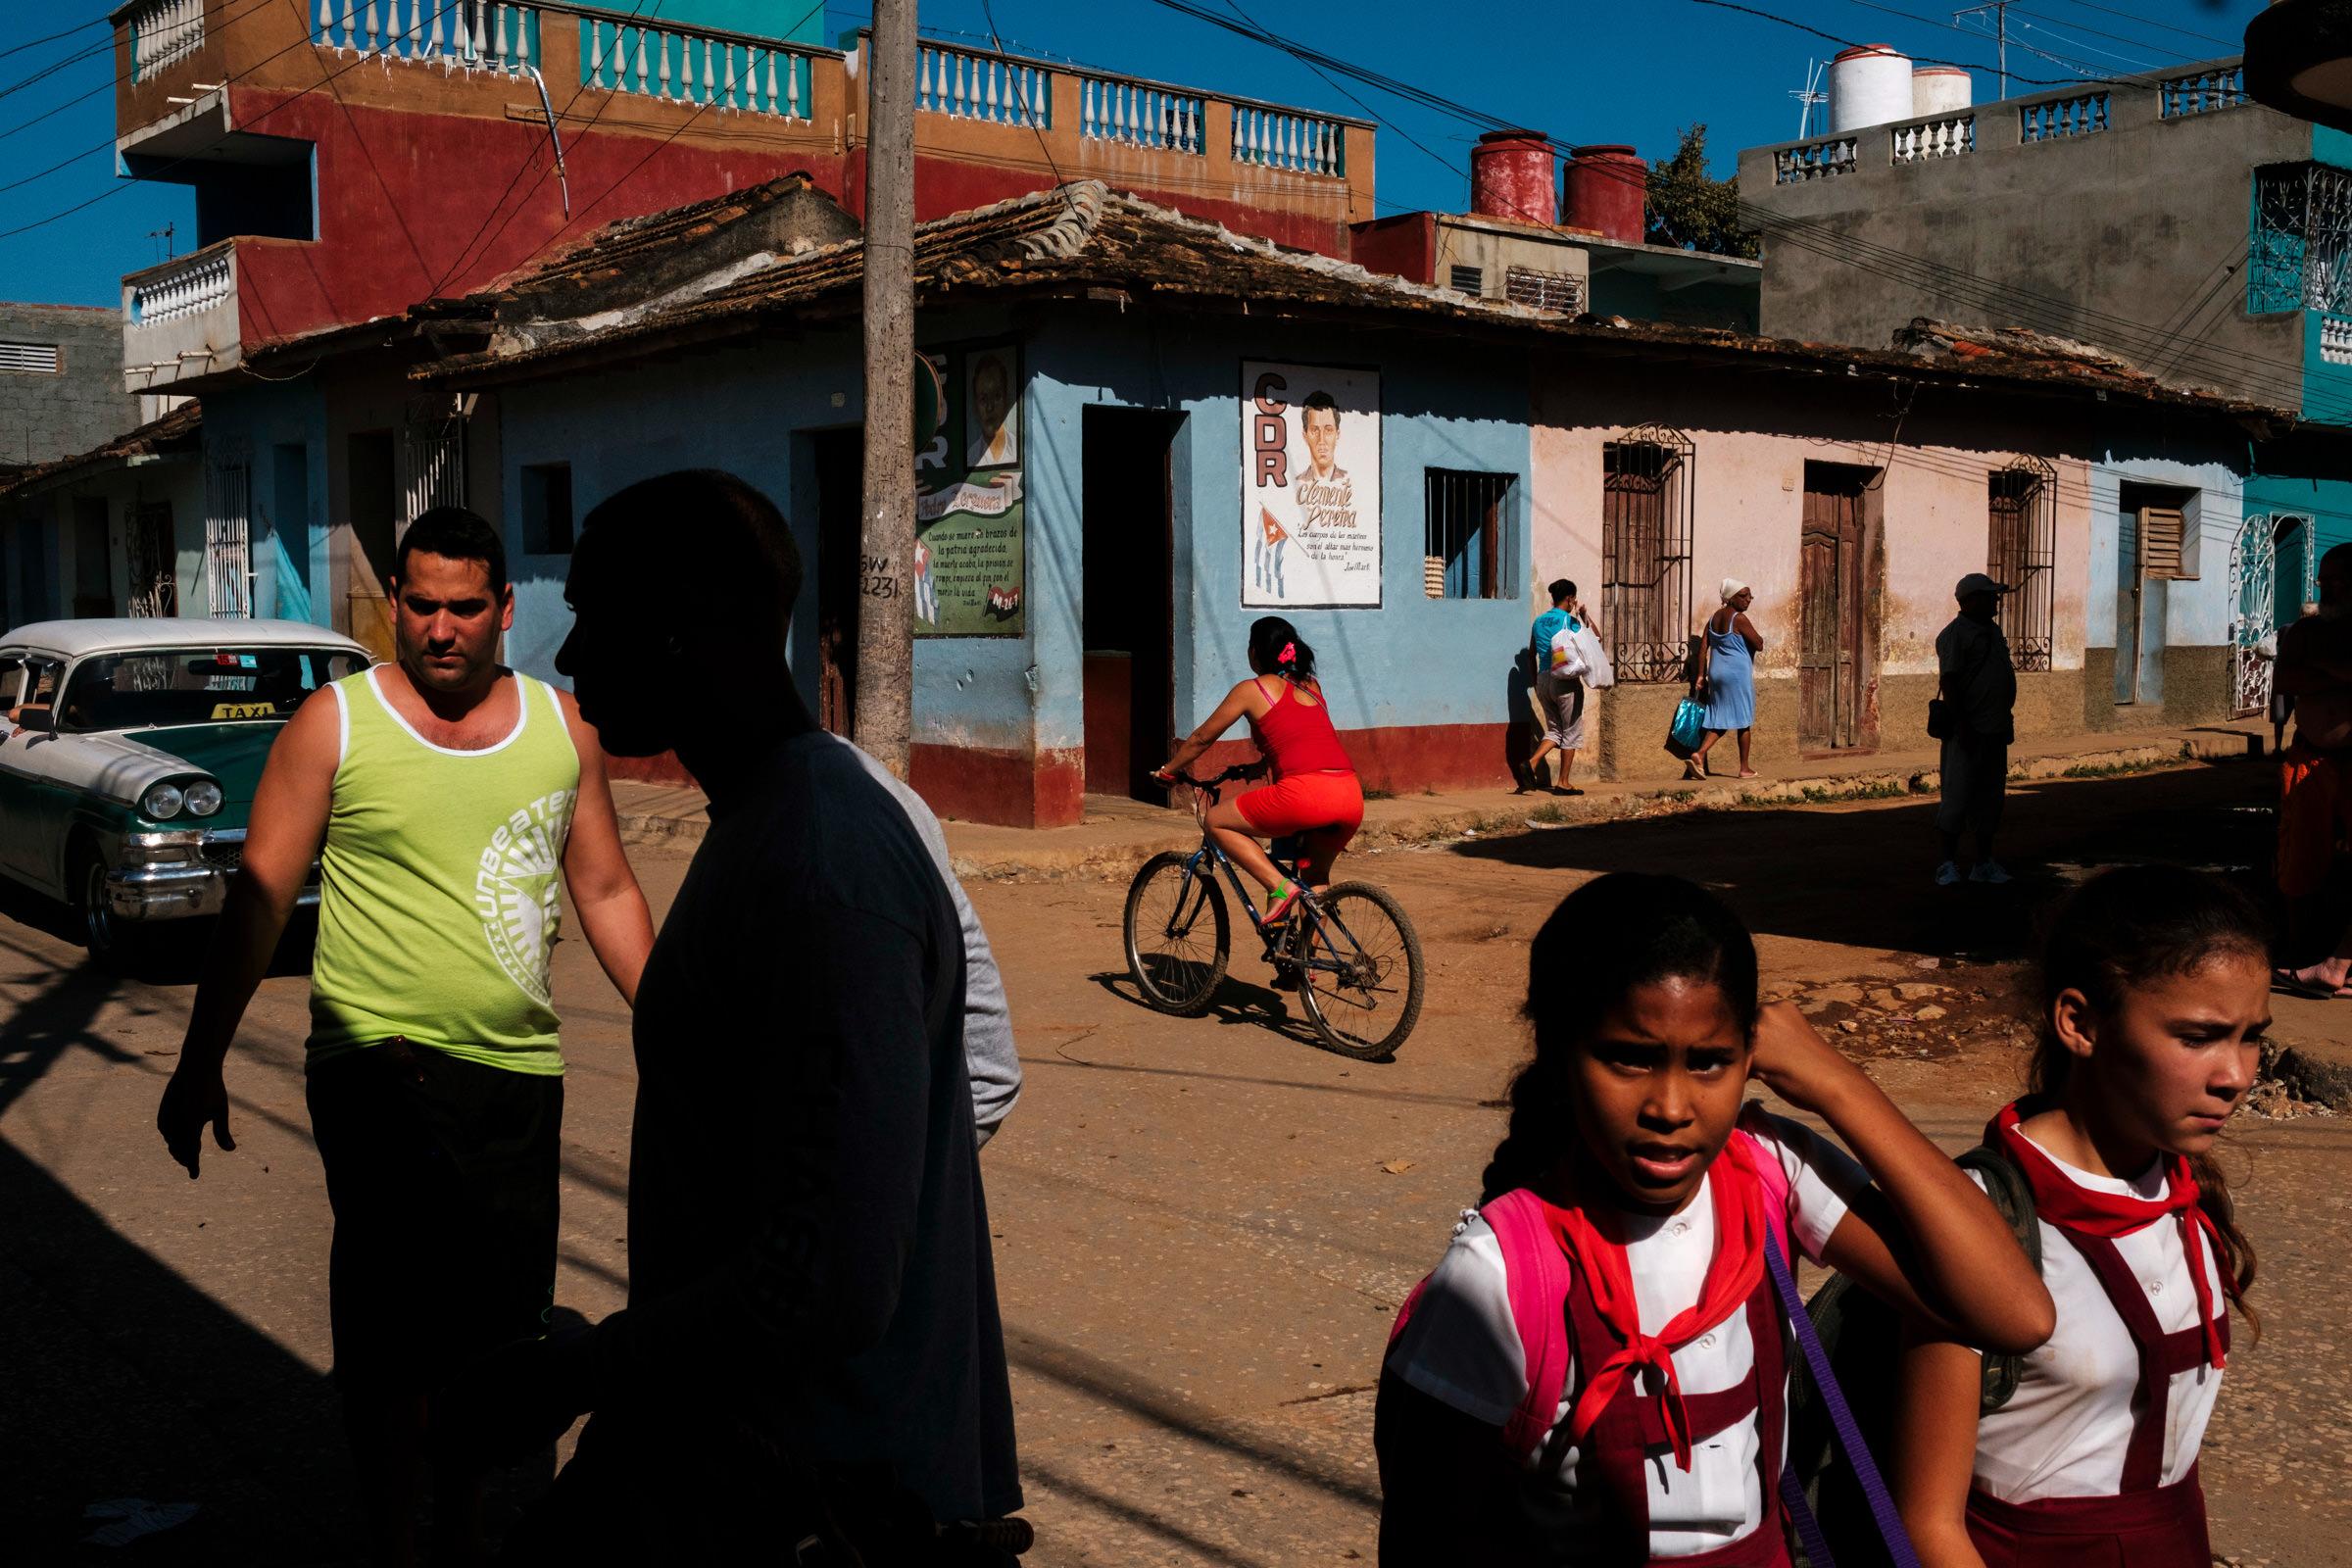 Cuba-Street-Photography-8